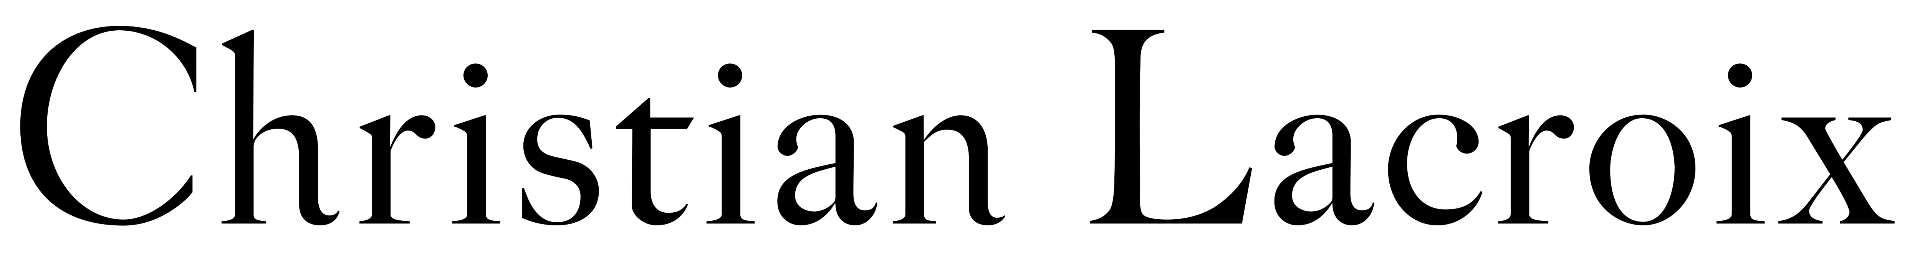 Christian Lacroix - Logo